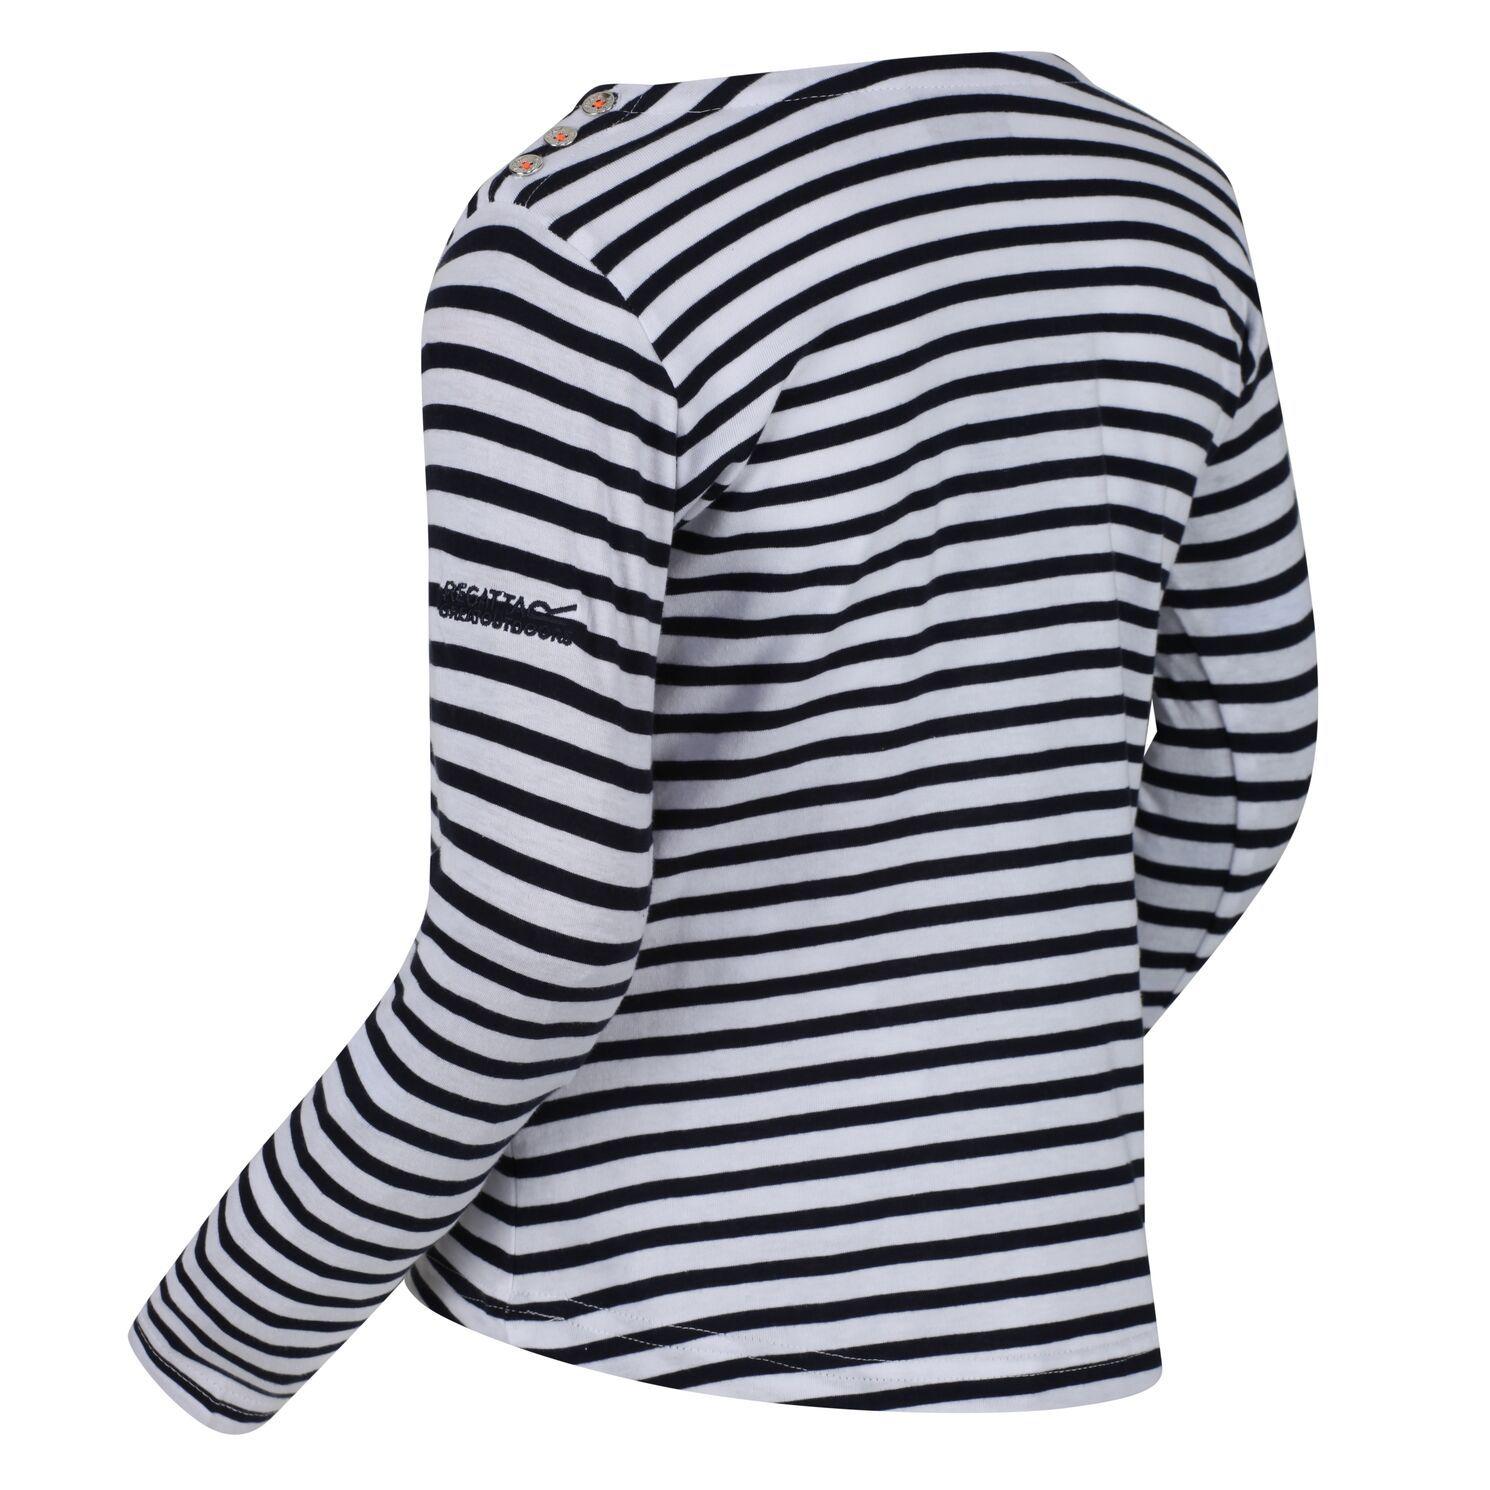 Regatta Childrens/Kids Carmella Long Sleeved Striped T-Shirt